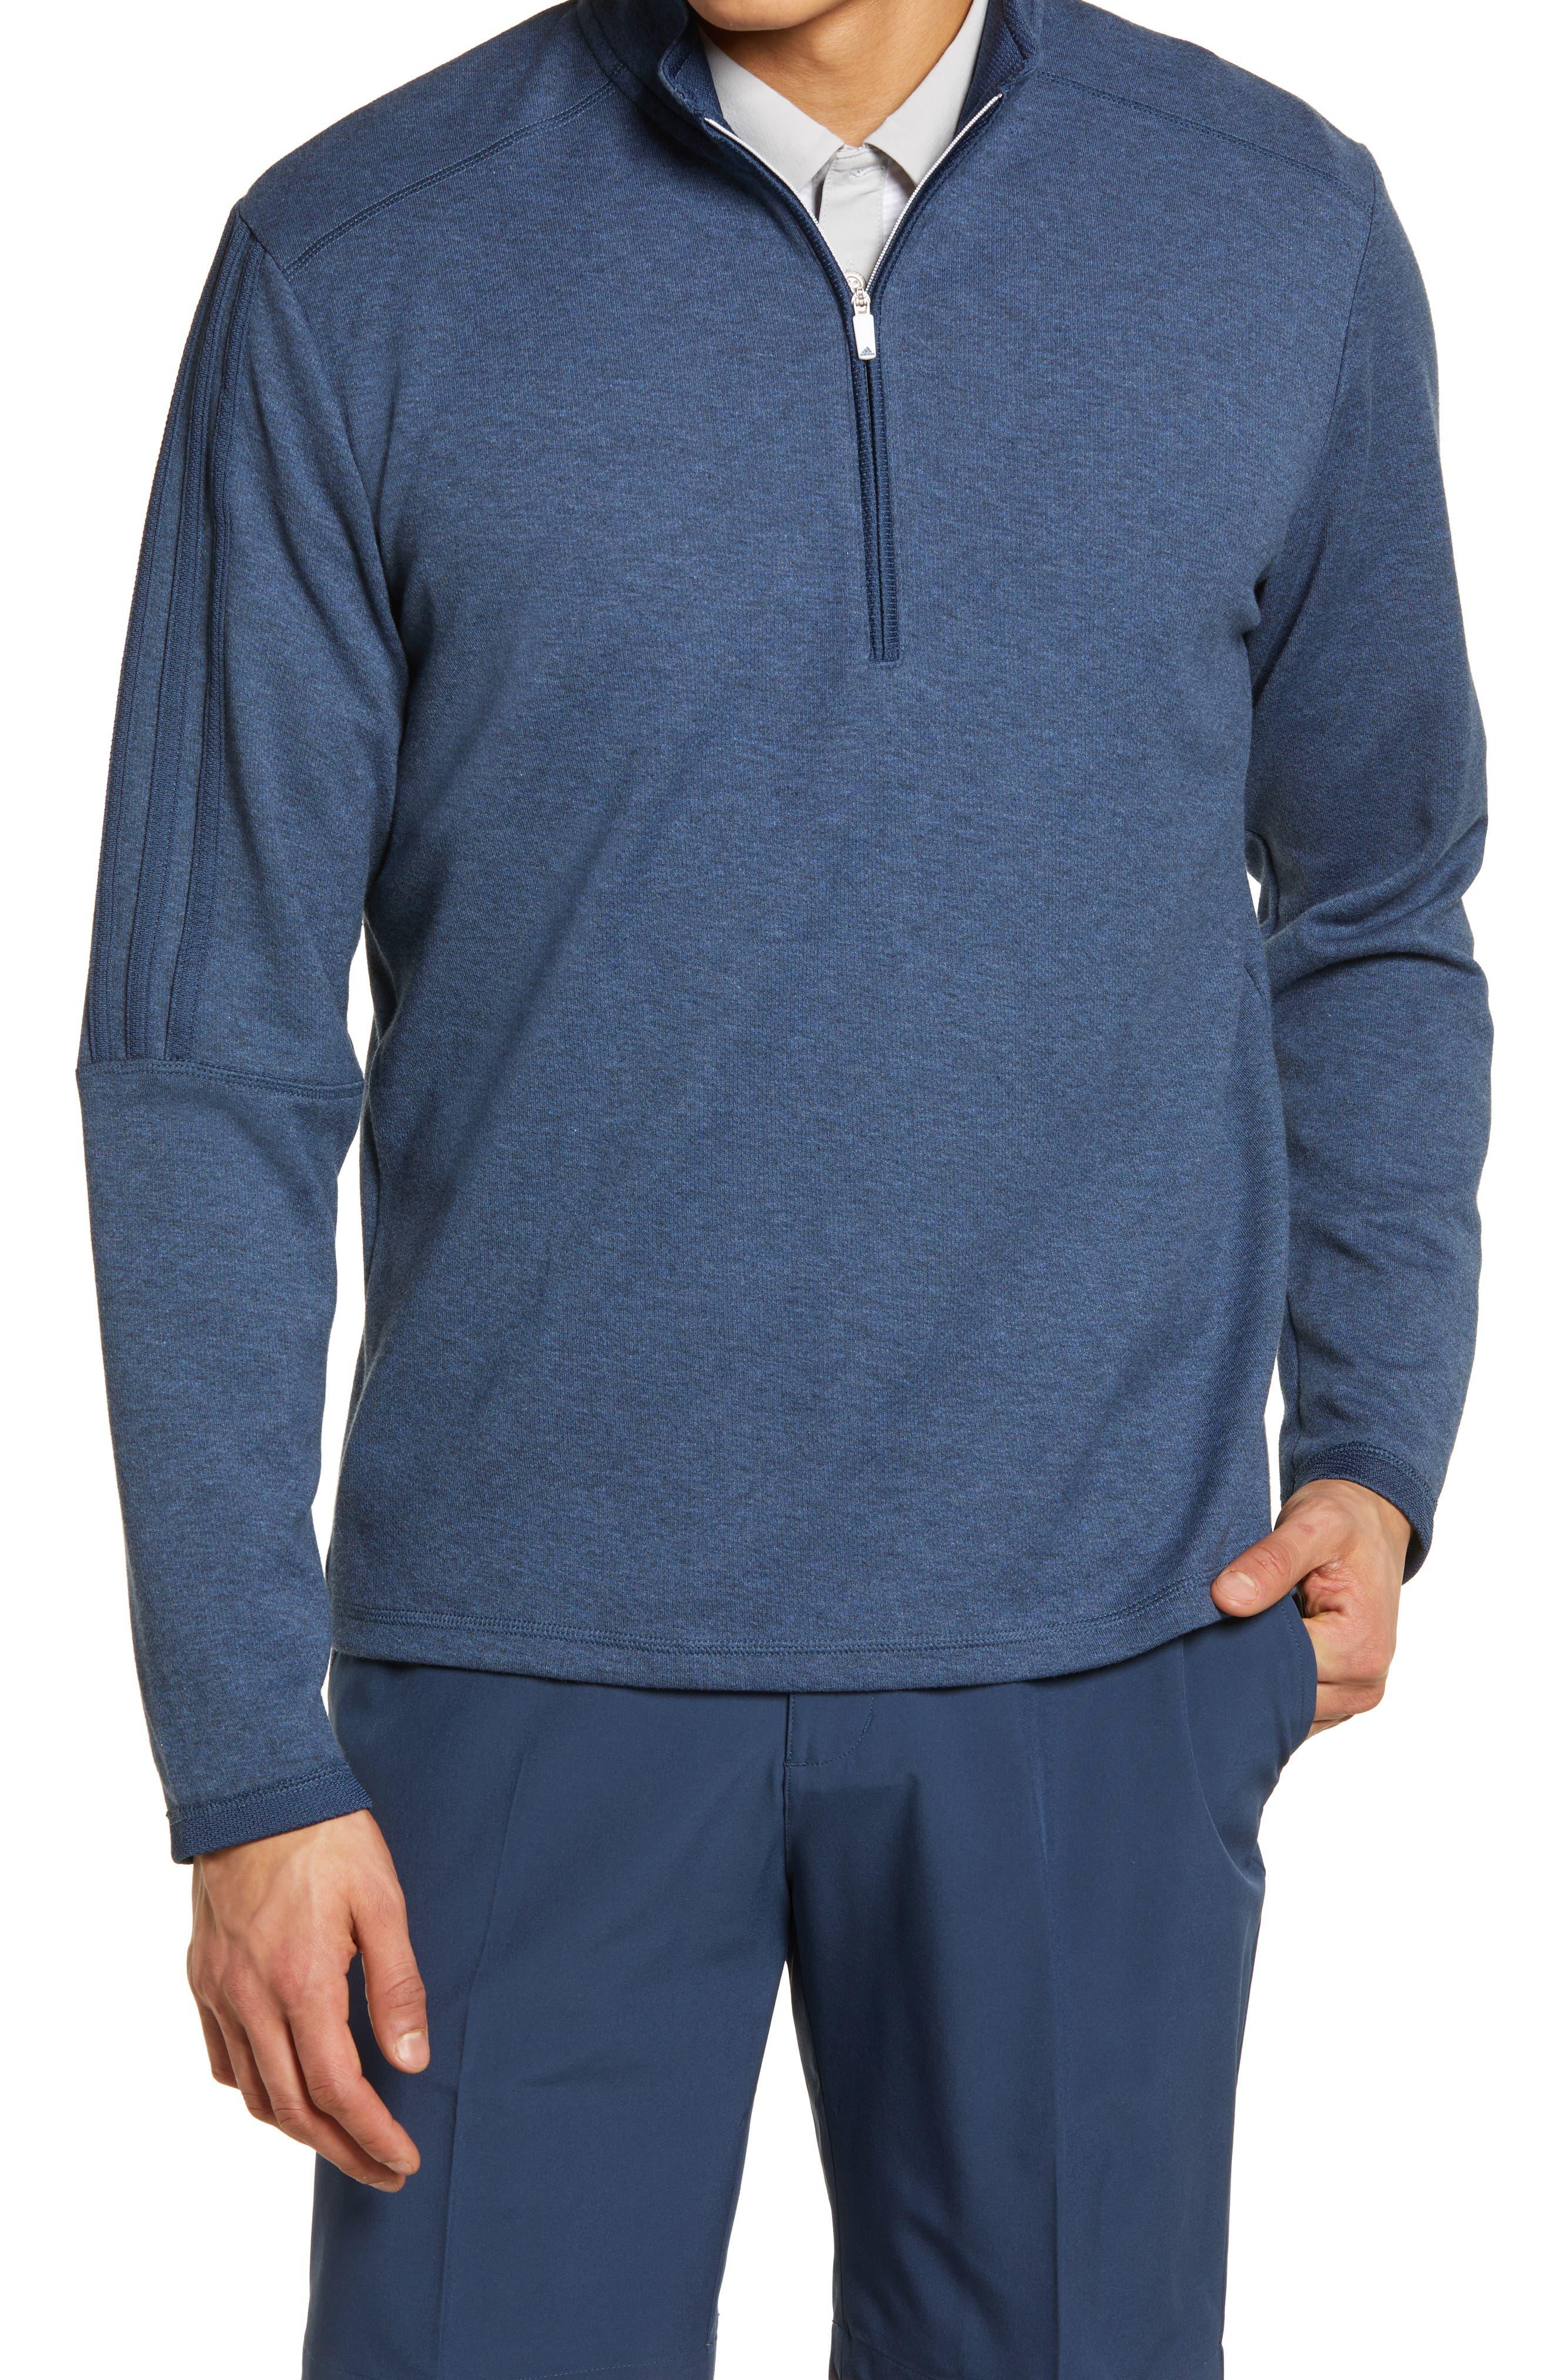 Men's 3-Stripes Quarter Zip Performance Pullover